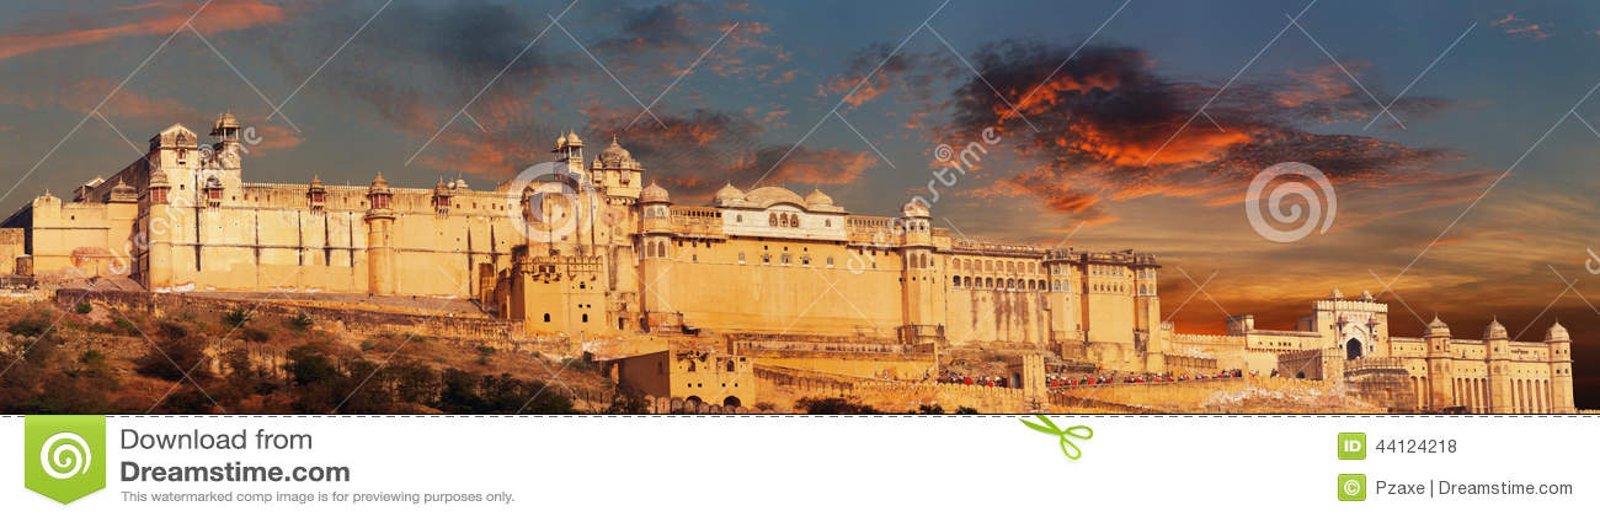 Het oriëntatiepunt van India - Jaipur, Amberfortpanorama